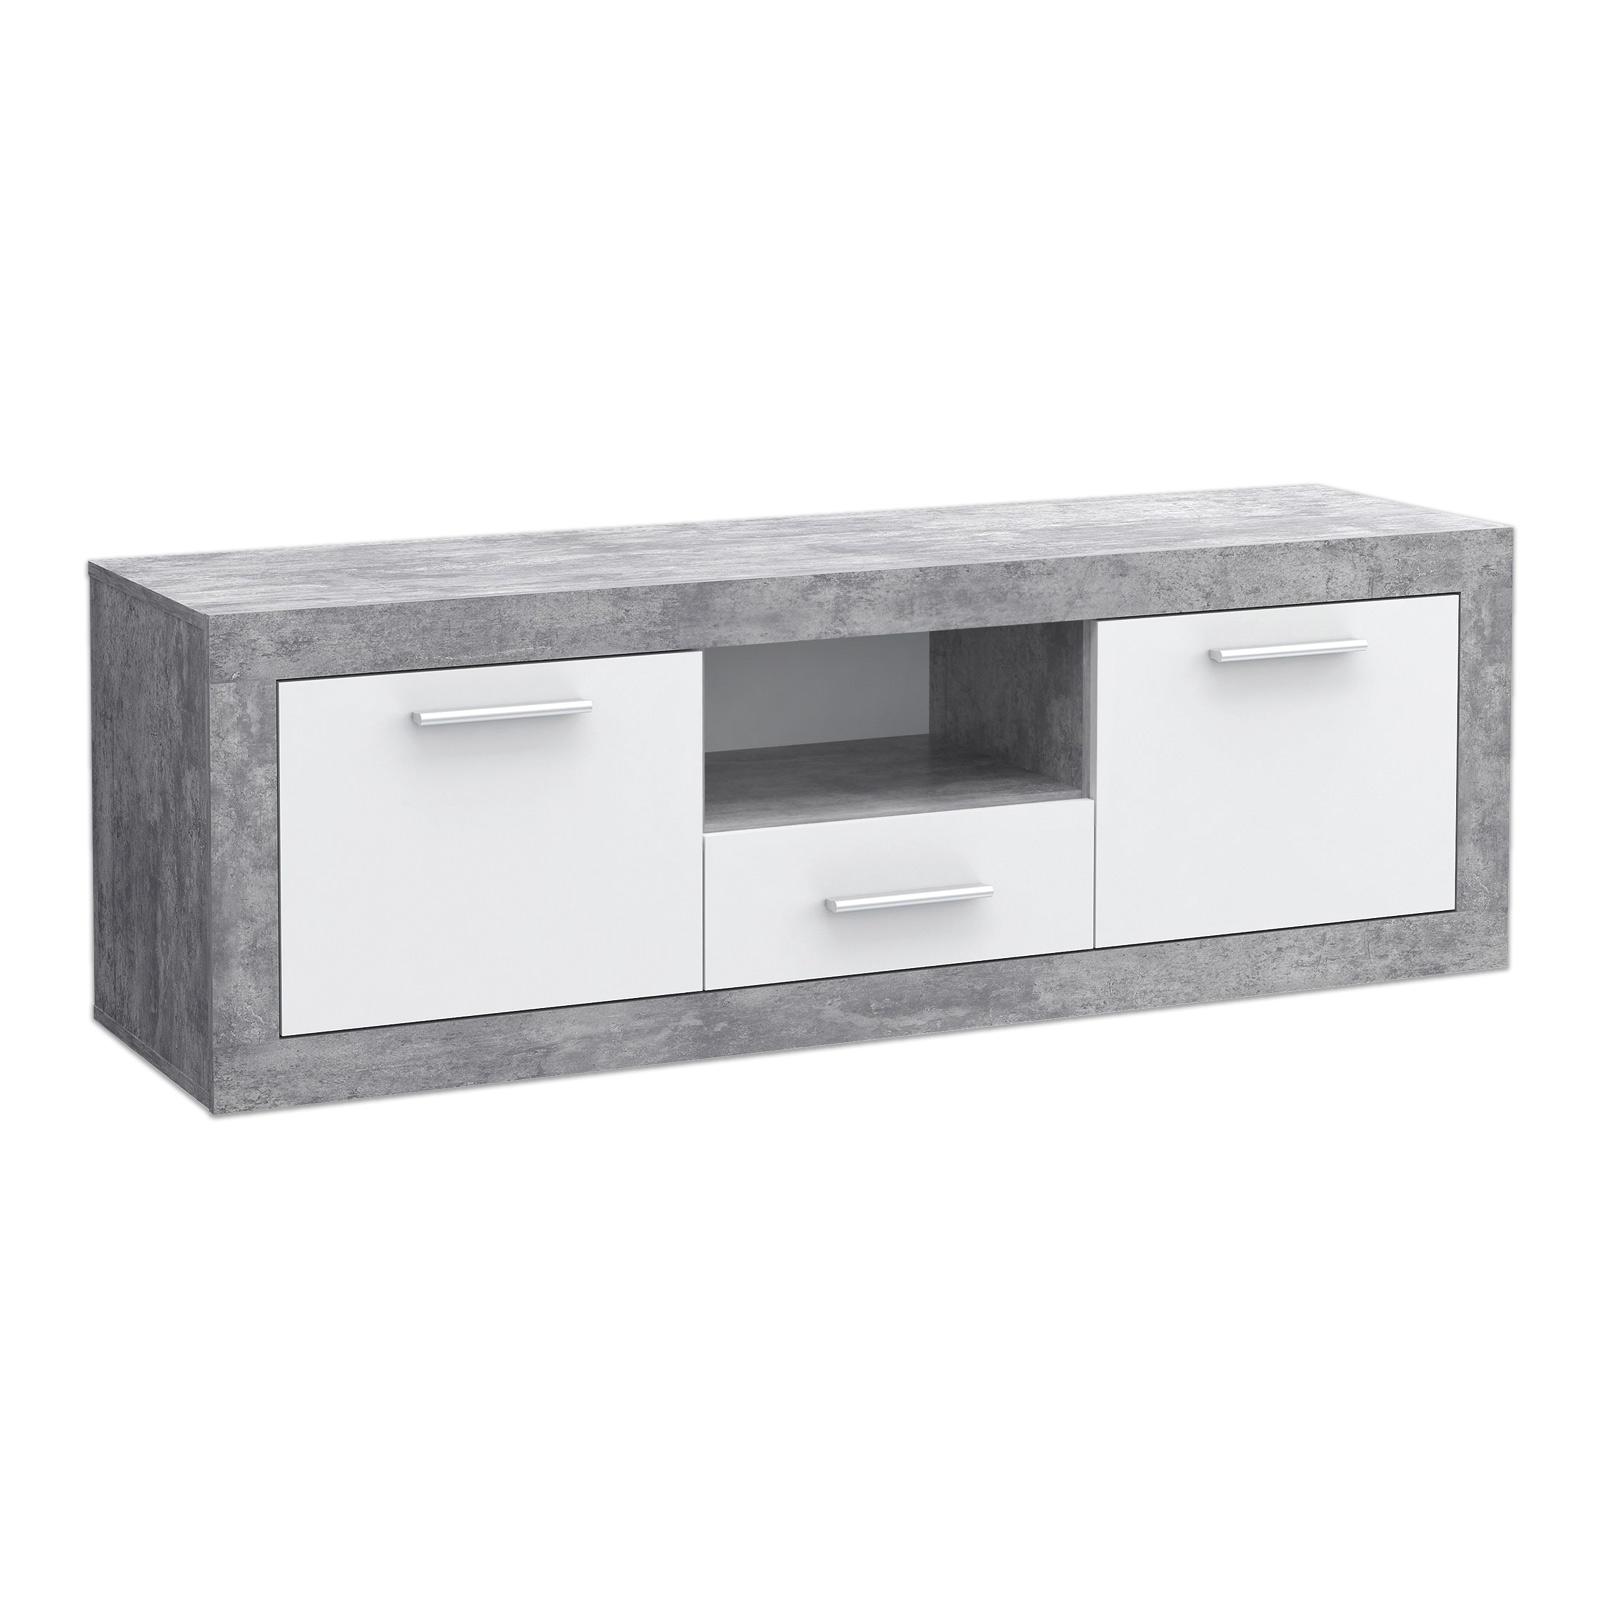 Lowboard Beton Optik Weiss 148x50 Cm Online Bei Roller Kaufen